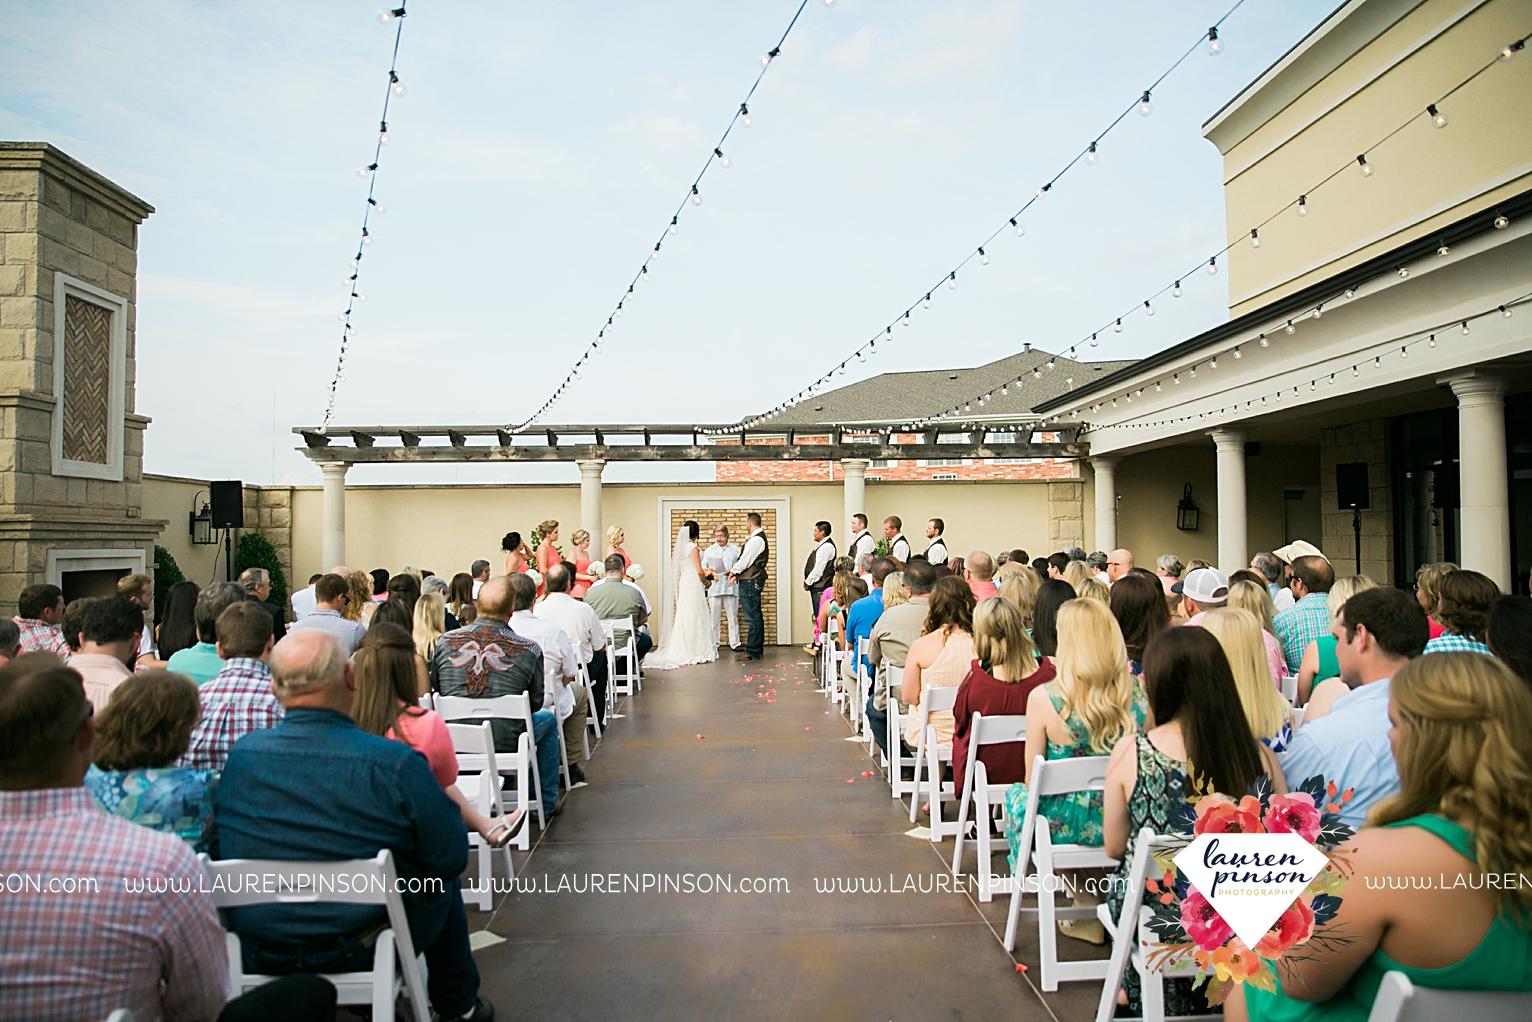 wichita-falls-texas-wedding-photographer-wellington-on-the-lake-with-mayfield-events_2971.jpg